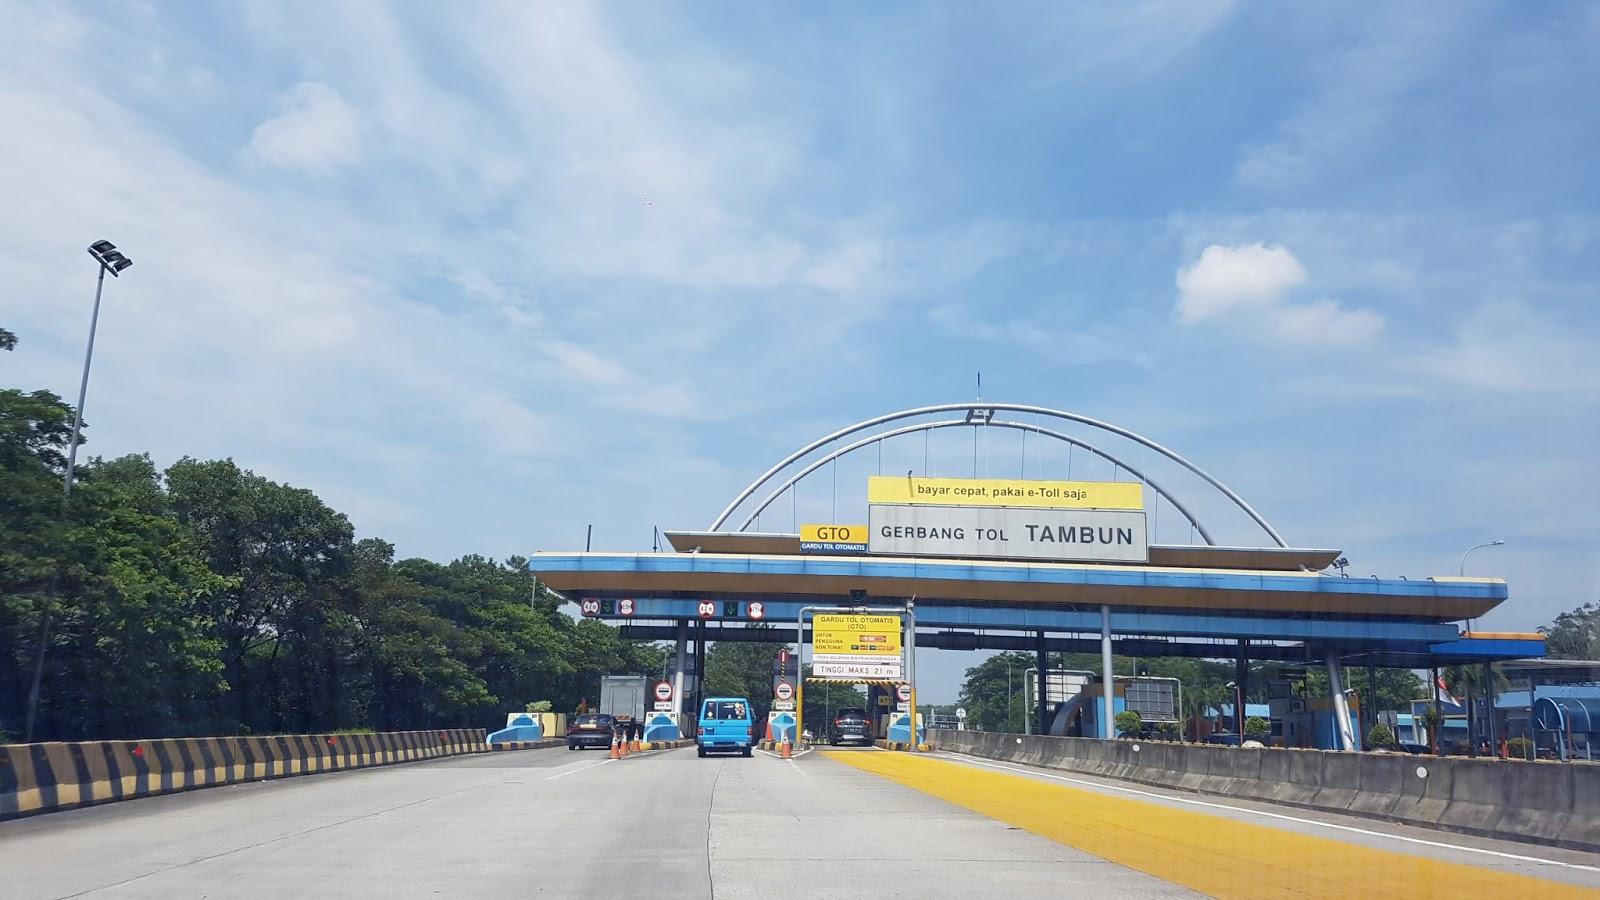 Pengalaman Pertama Main Ke Go Wet Waterpark Grand Wisata Bekasi Tiket Masuk Nah Nanti Setelah Bertemu Tulisan Seperti Ini Untuk Menuju Lokasi Kamu Akan Petunjuk Jalannya Kok